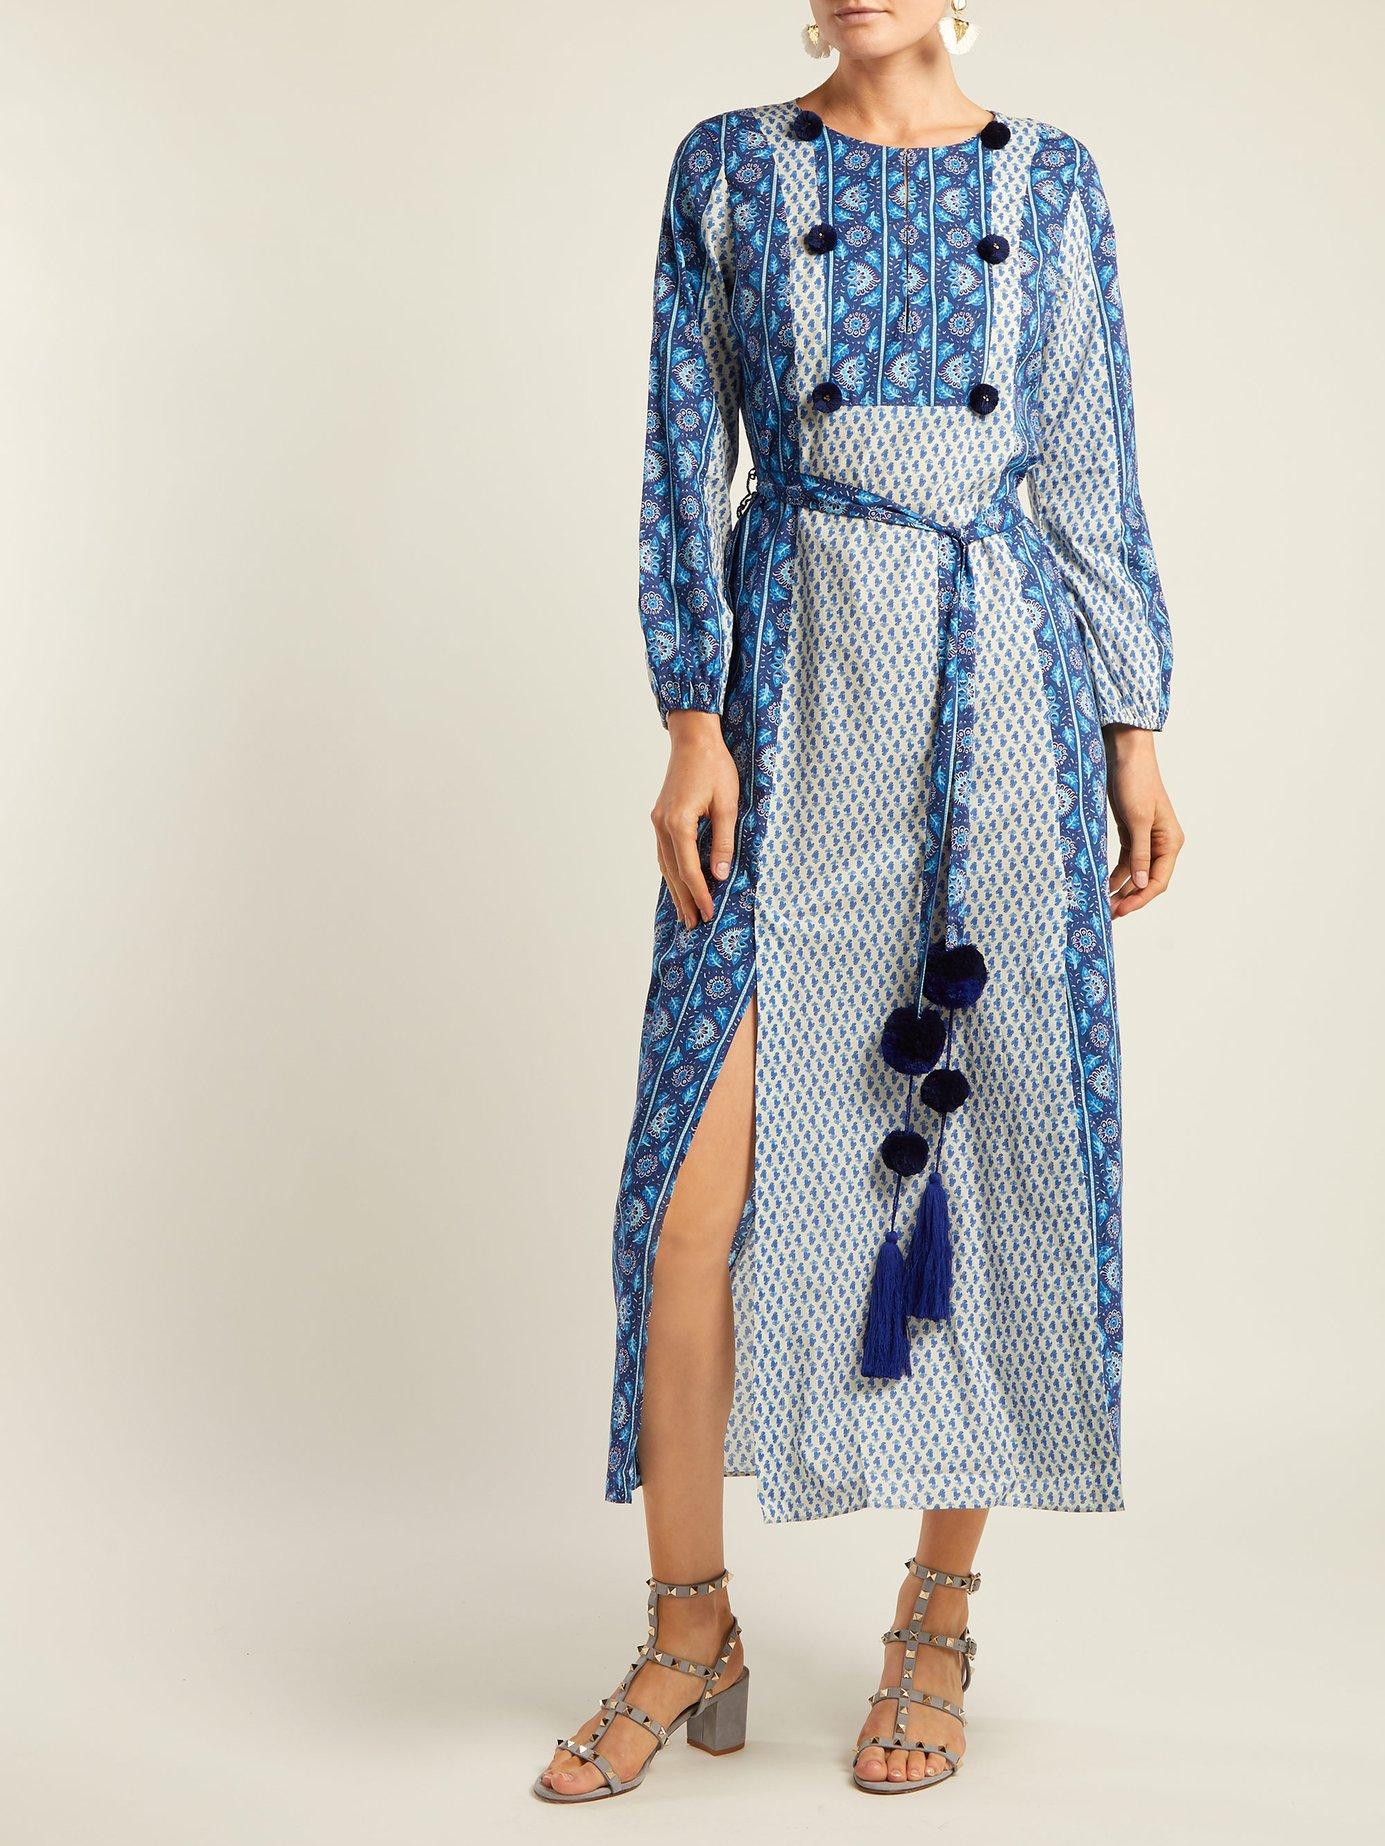 Ravenna cotton maxi dress by Figue